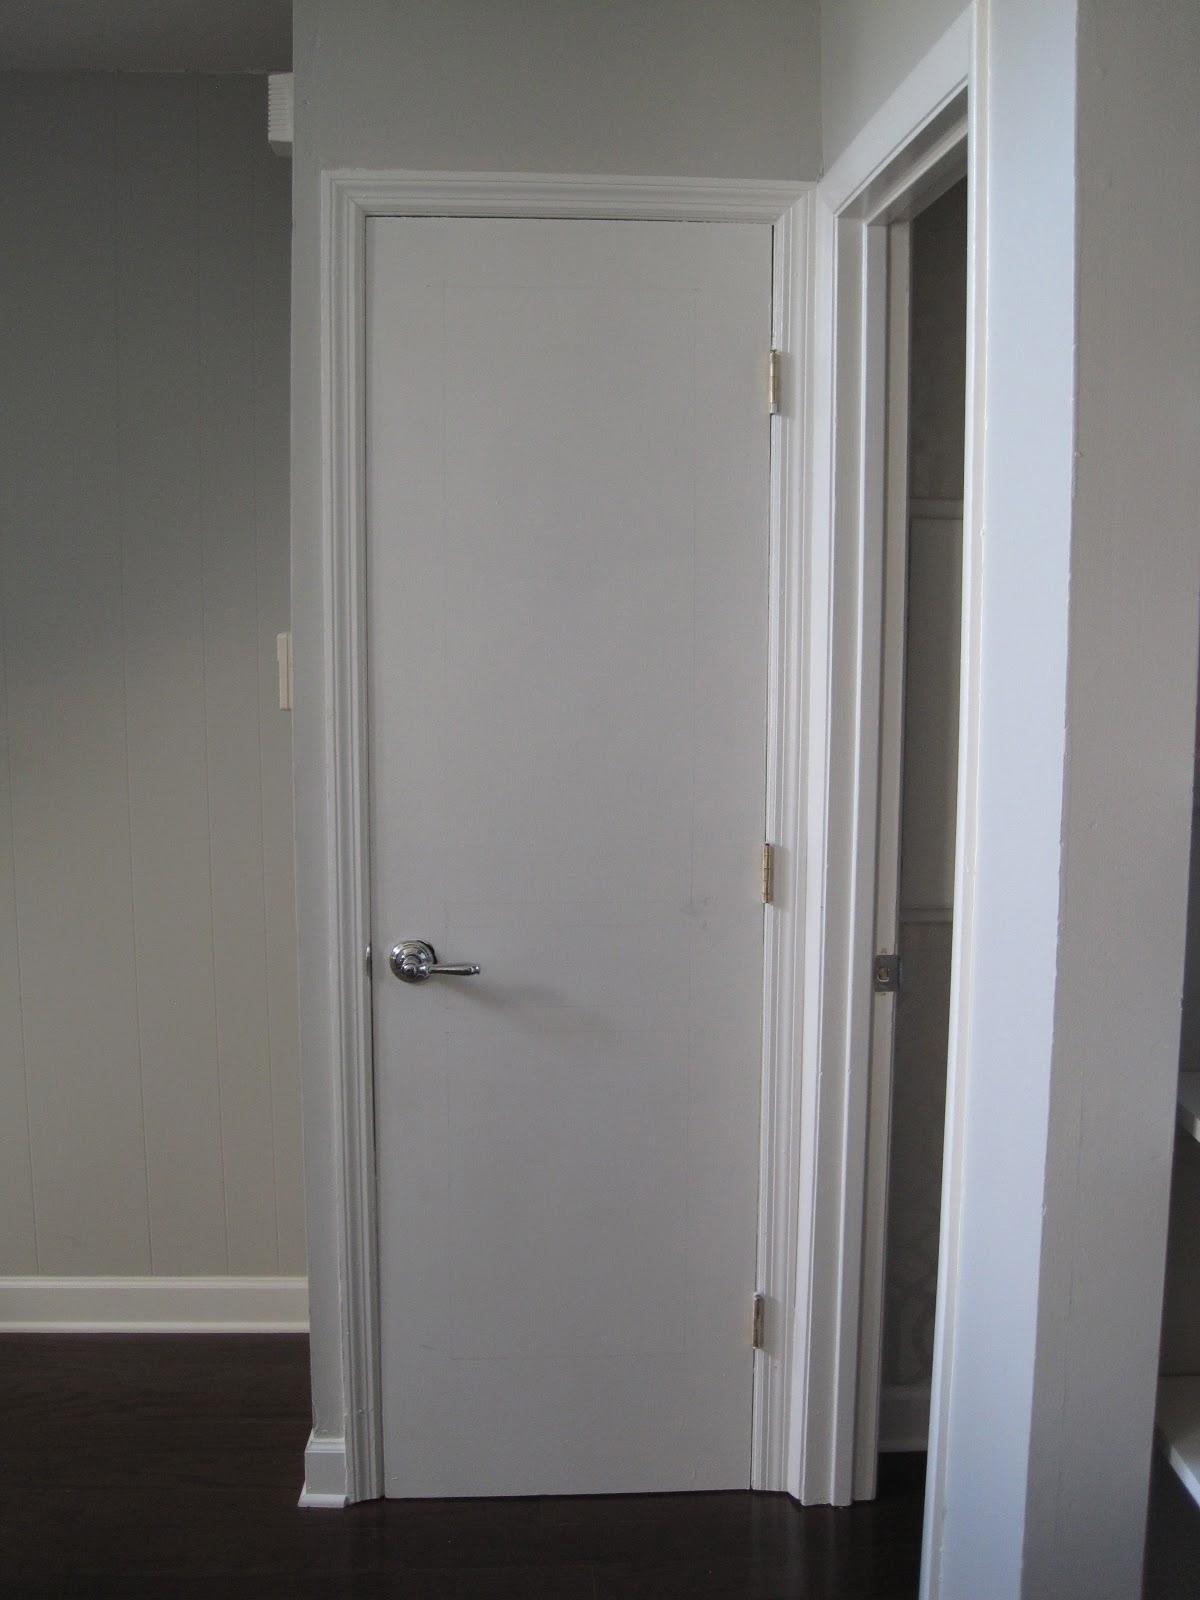 Flat Doors & Upgrading Flat Doors With Panel Moulds